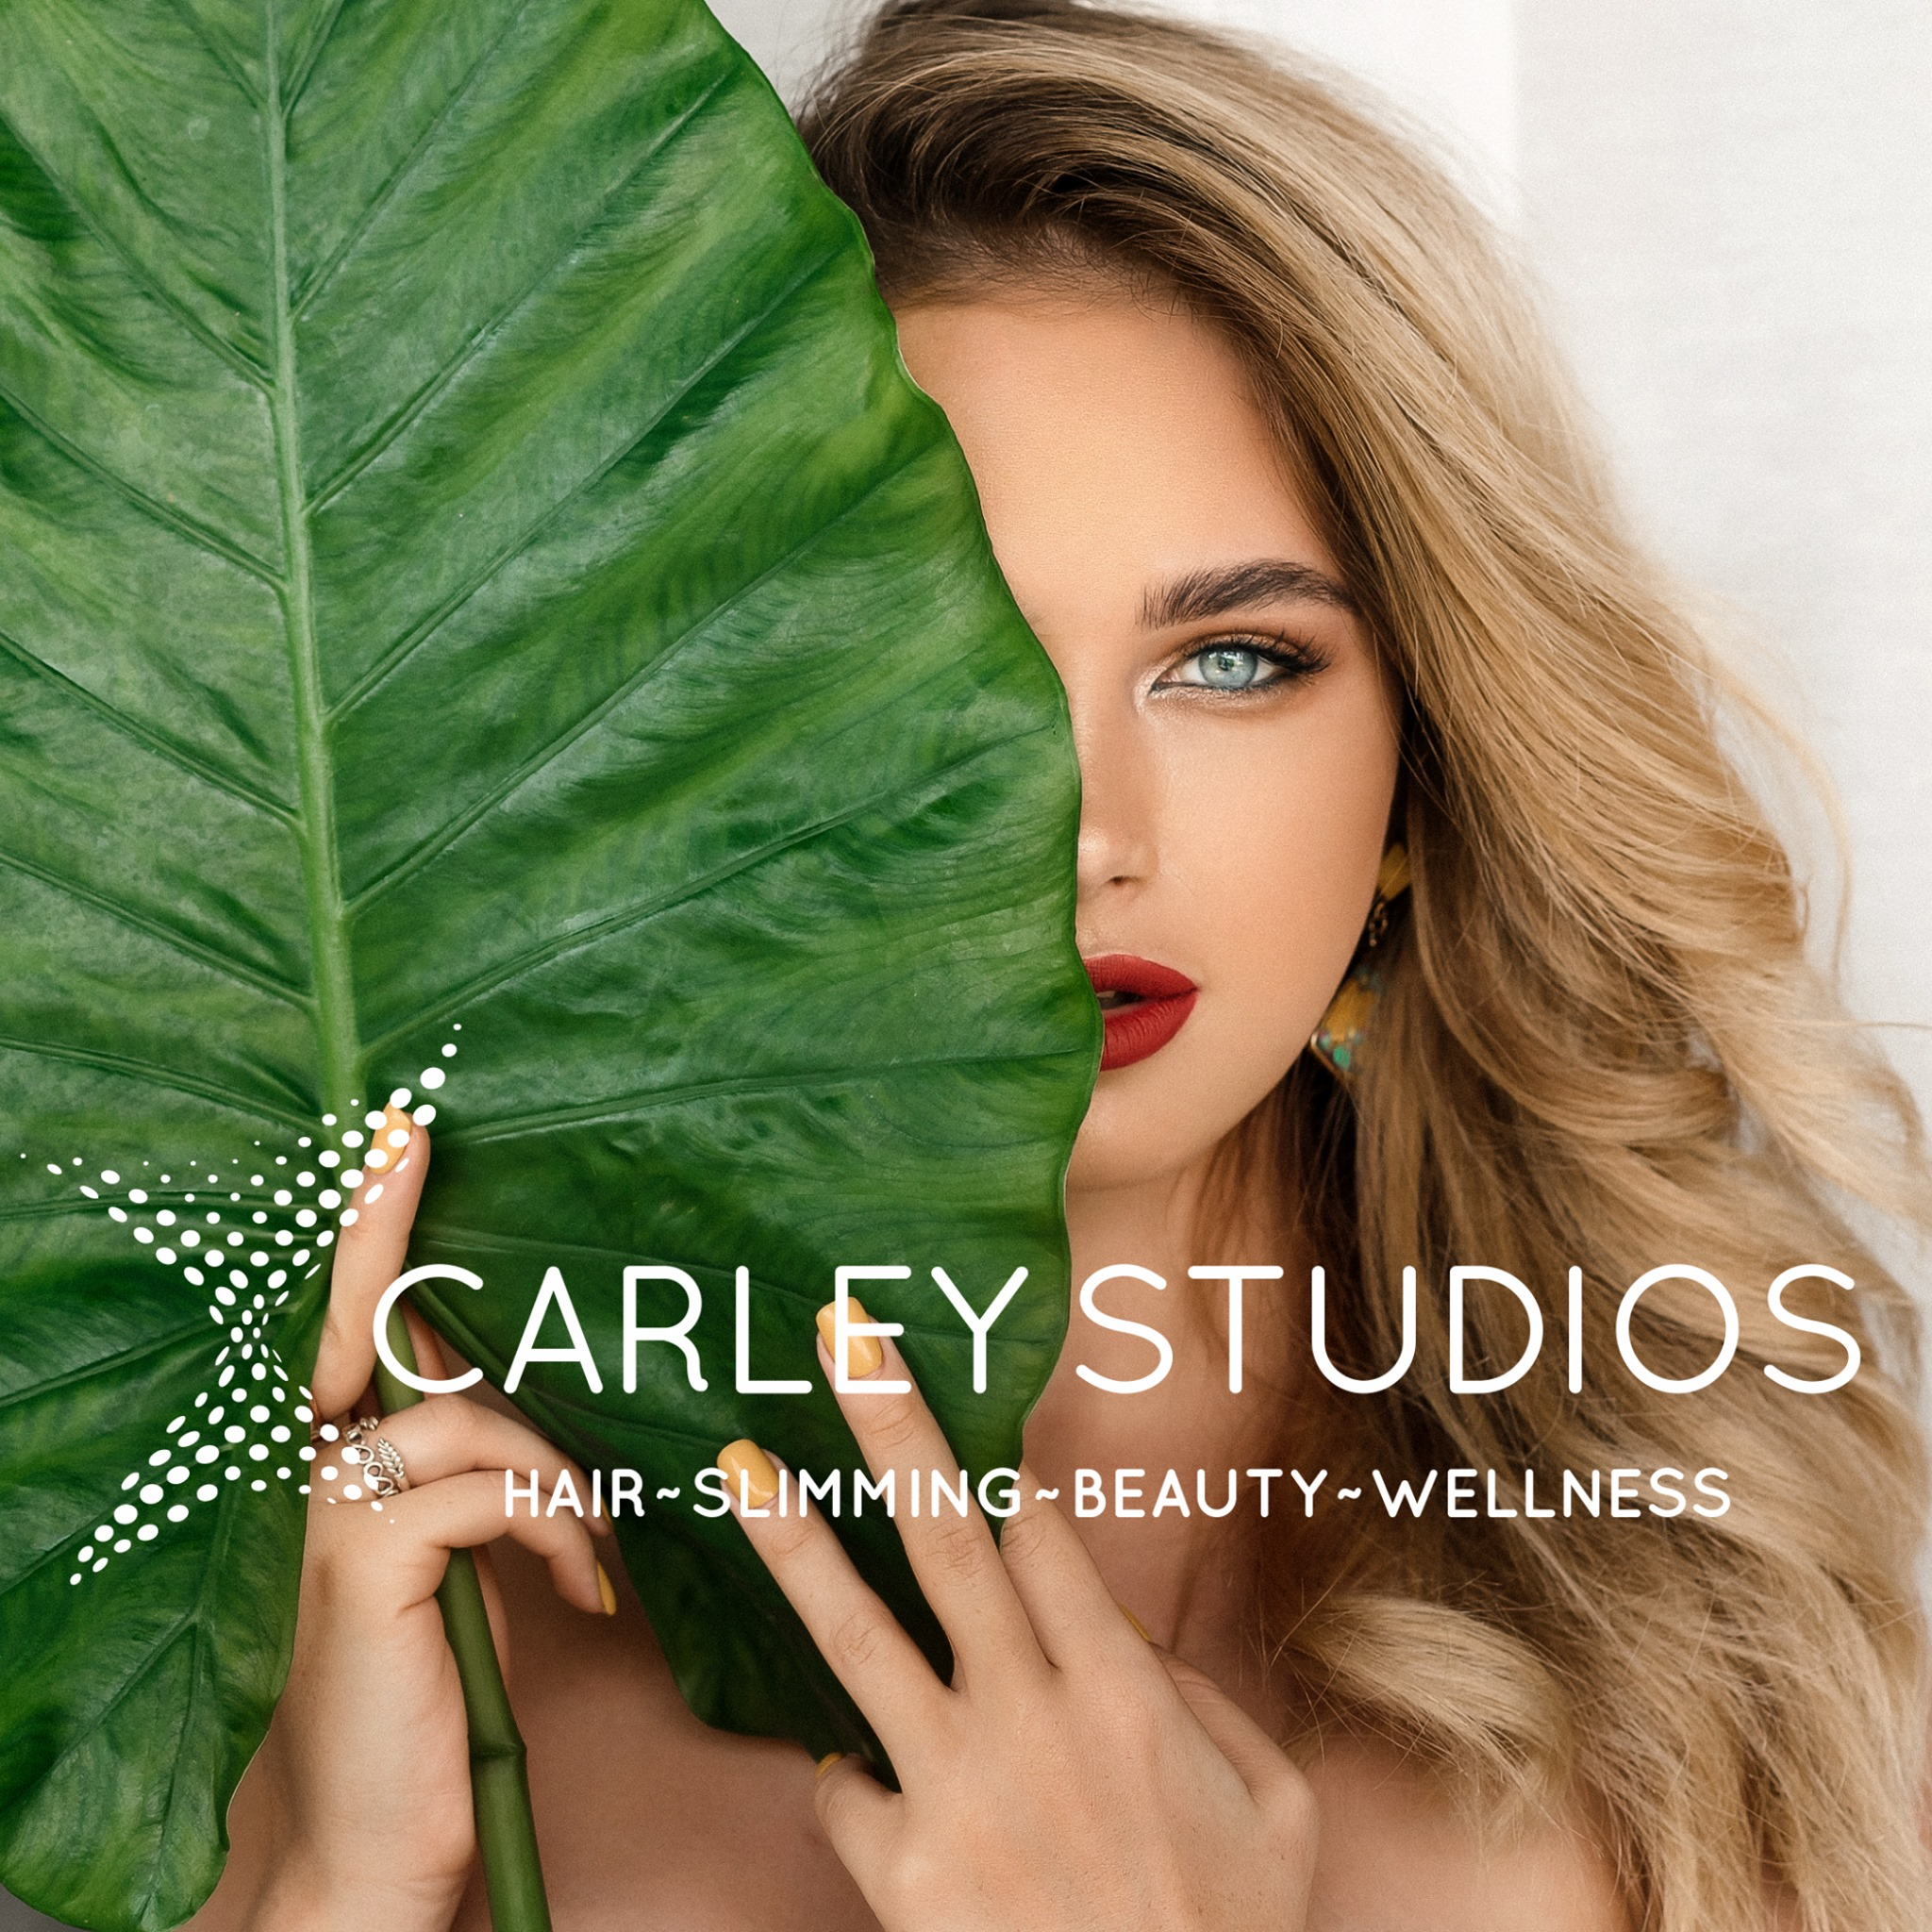 Carley Studios